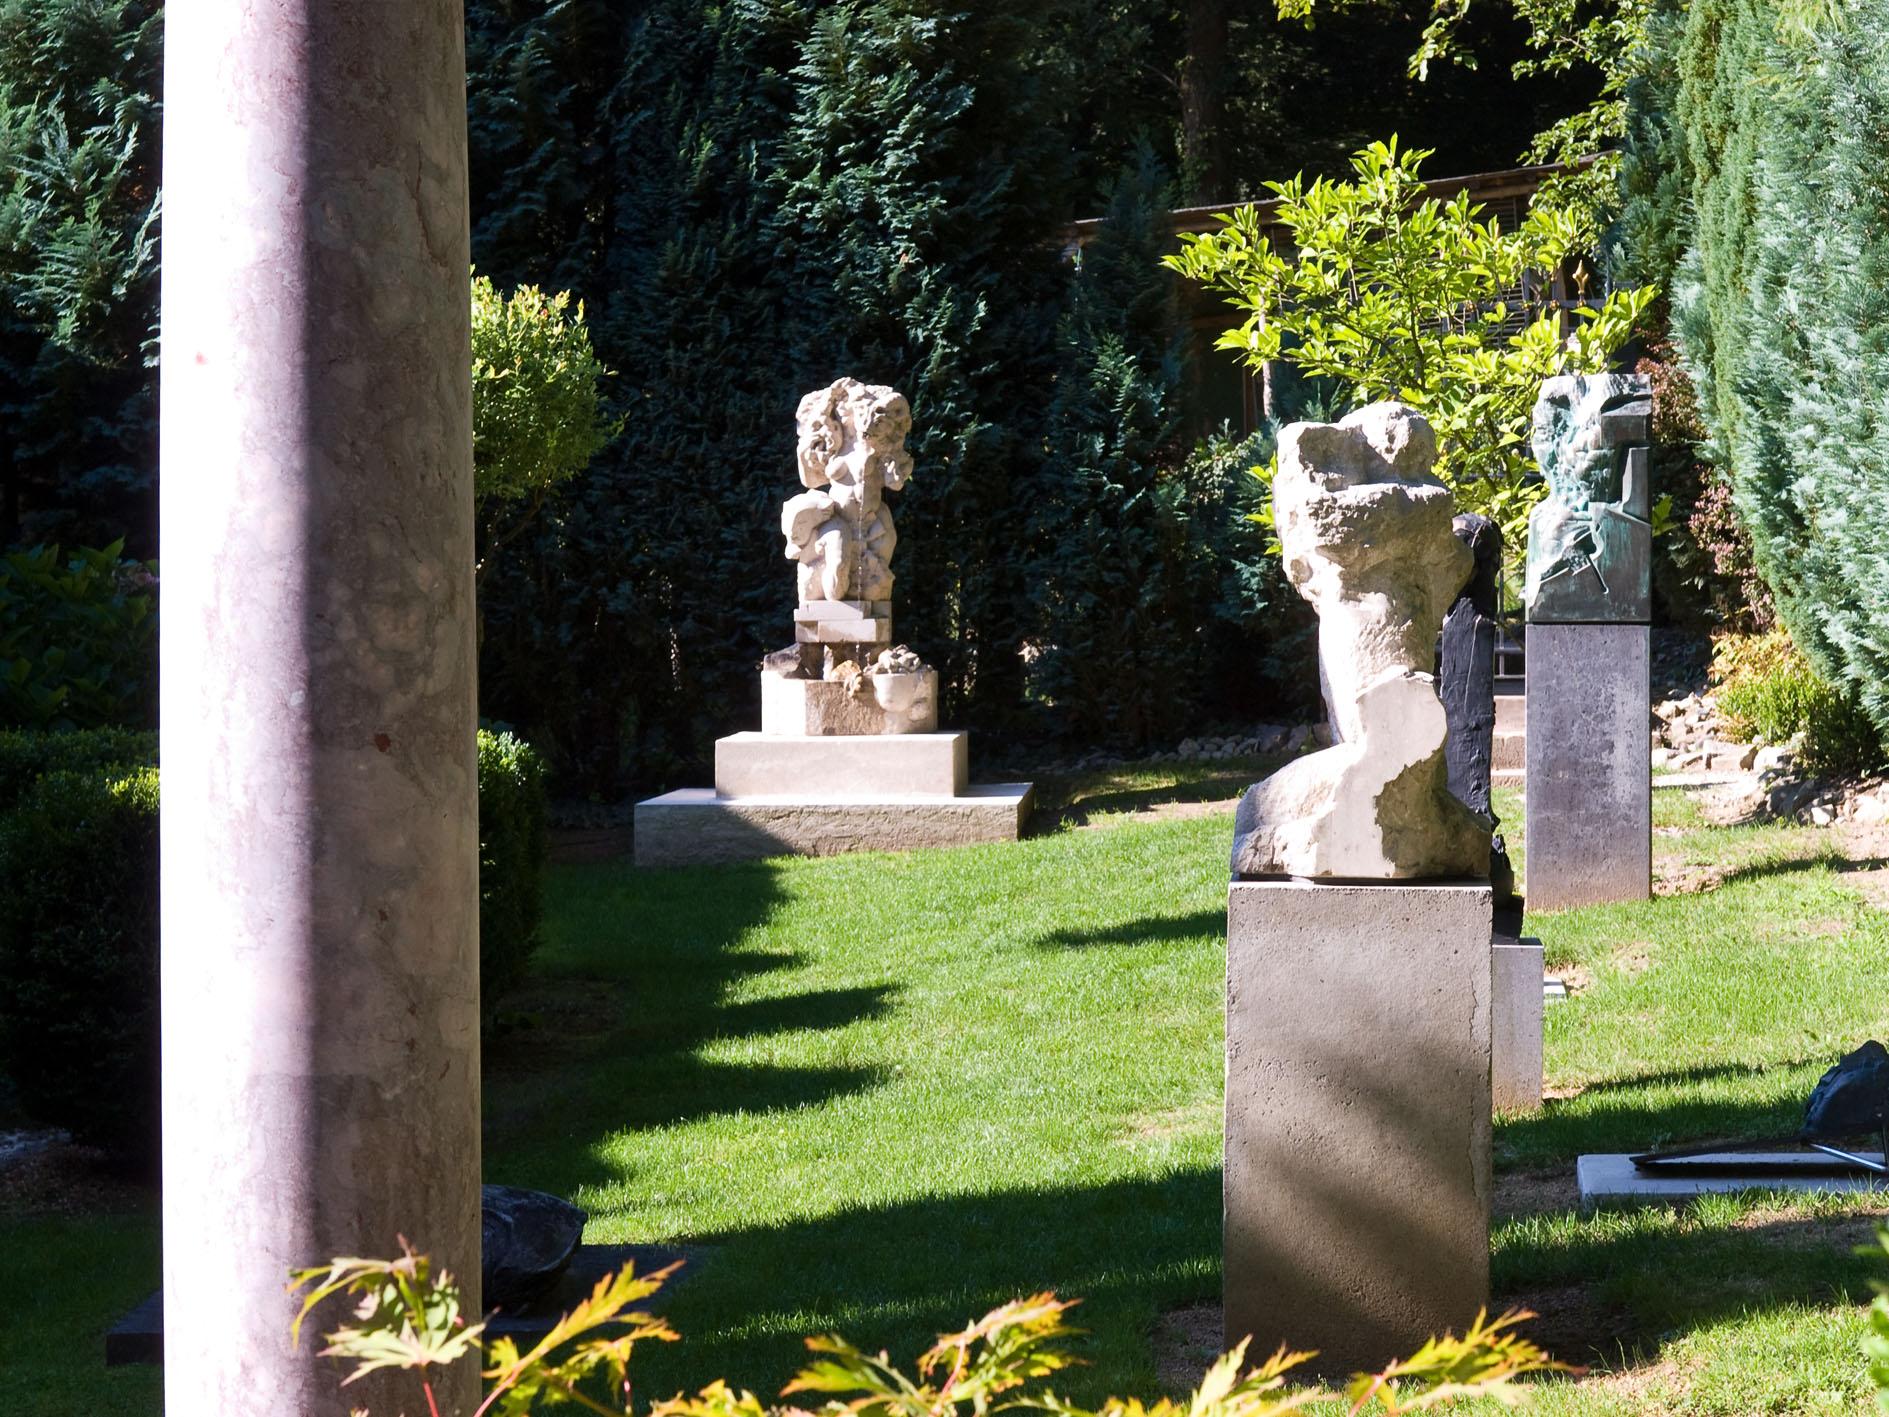 Full Size of Skulpturen Garten Kaufen Gartenskulpturen Aus Steinguss Stein Antik Moderne Edelstahl Modern Selber Machen Skulpturengarten Darmstadt Und Landschaftsbau Garten Skulpturen Garten